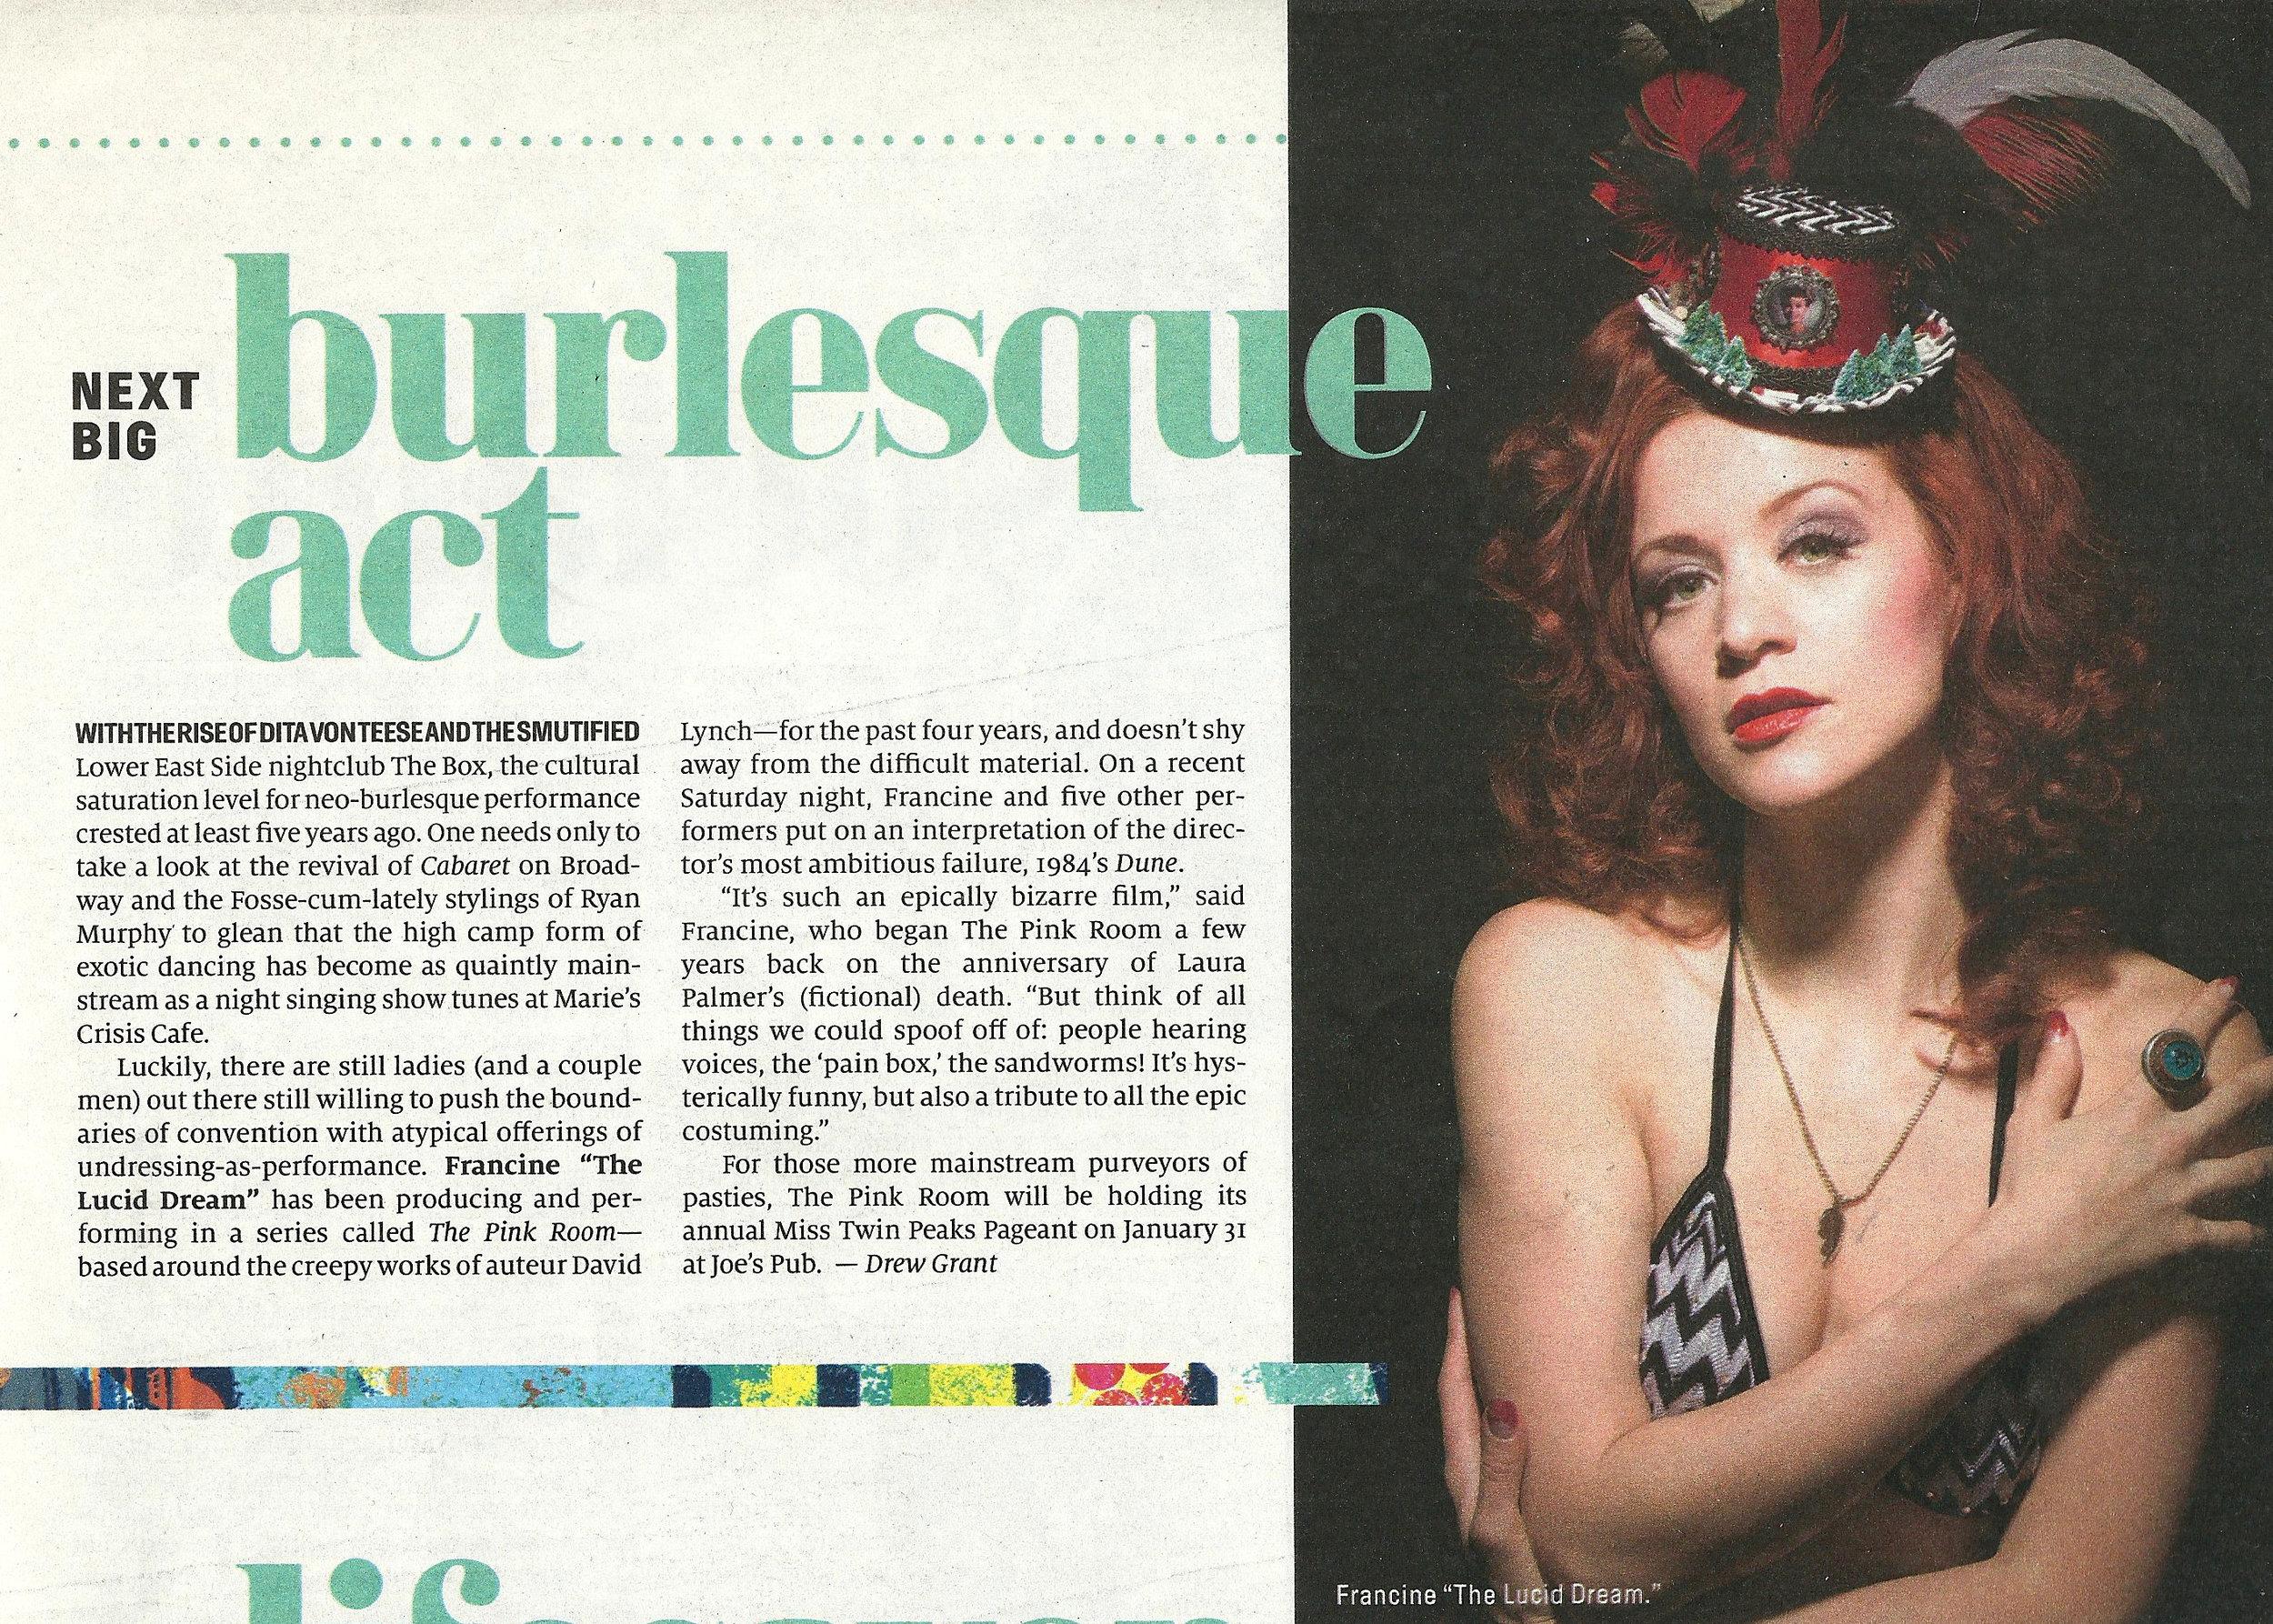 "- The ""Next Big Burlesque Act"" -  New York Observer"